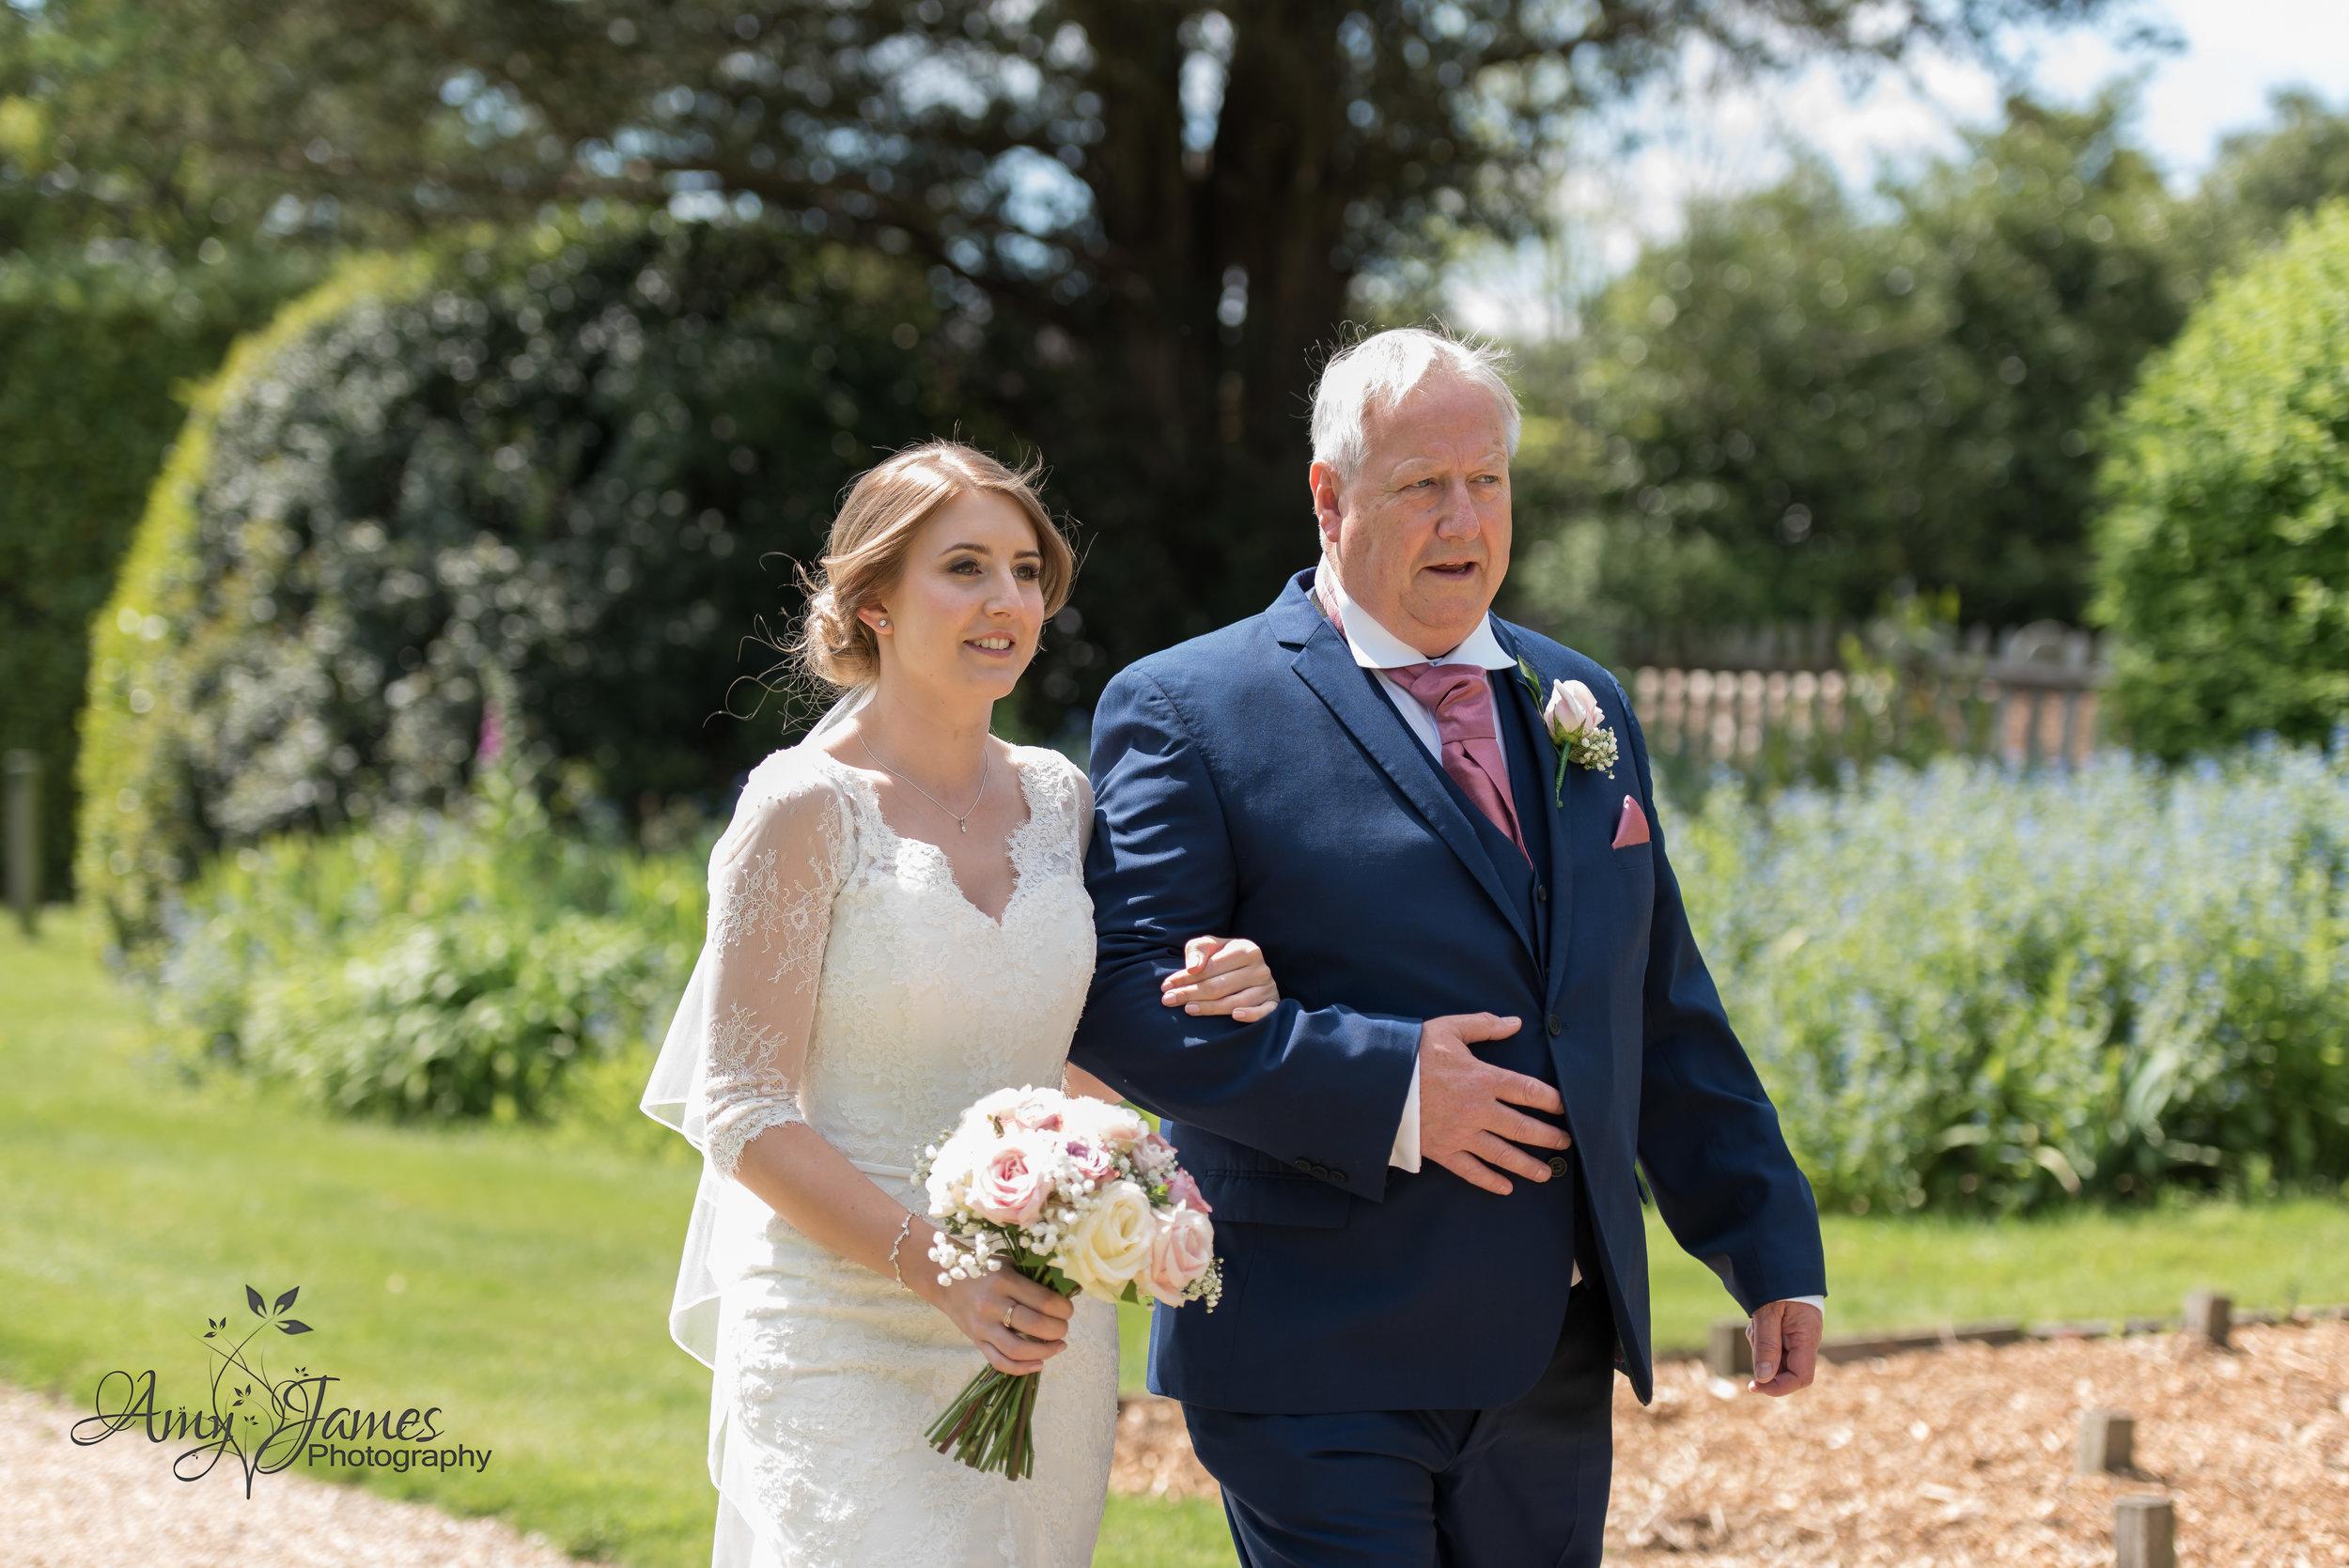 Hampshire Wedding Photographer | Highfield Park Wedding Venue | Highfield Park Wedding Photographer | Amy James Photography | UK Outdoor wedding venue